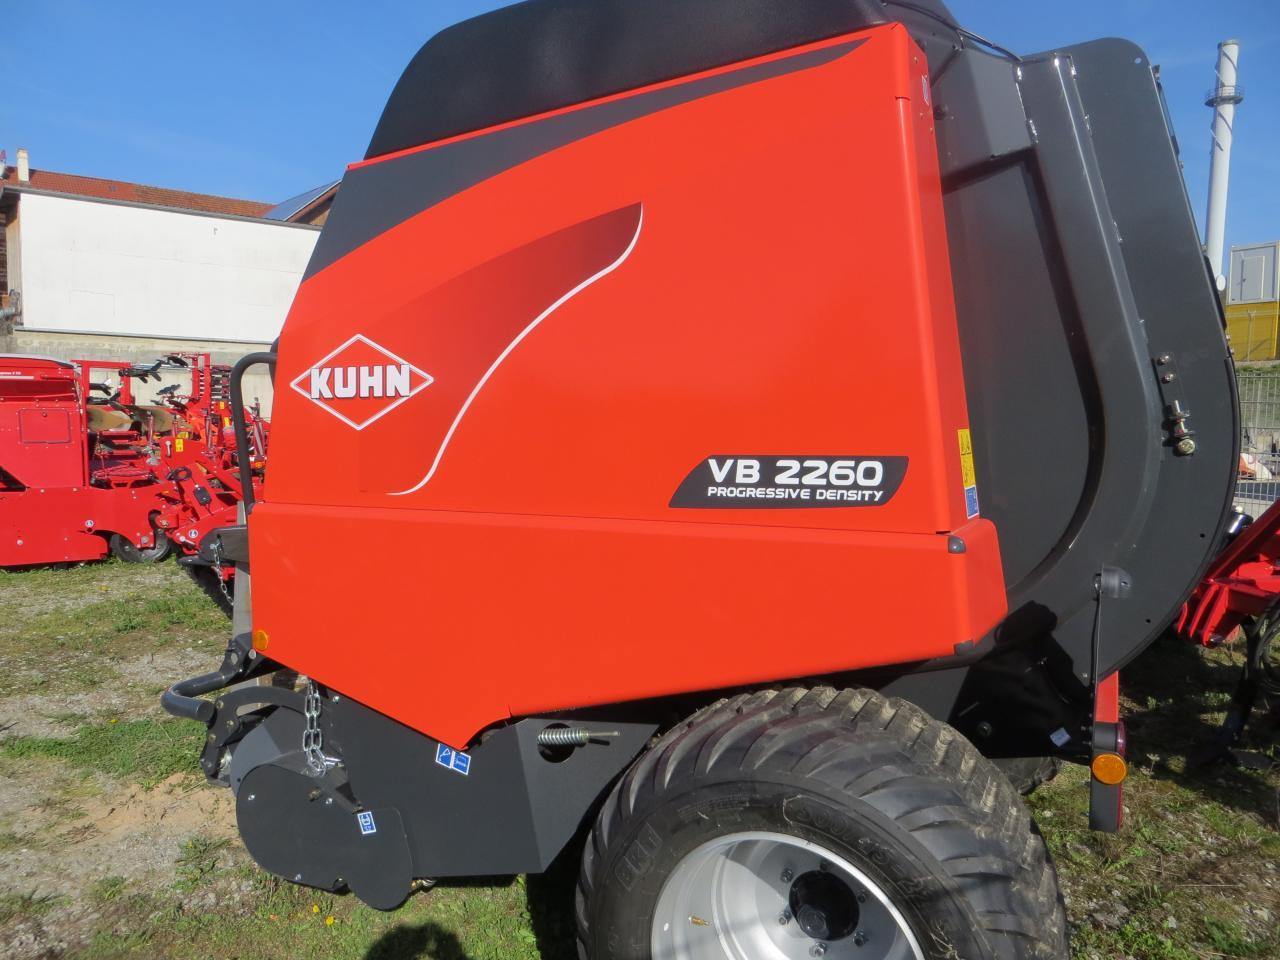 Kuhn VB 2260 Select